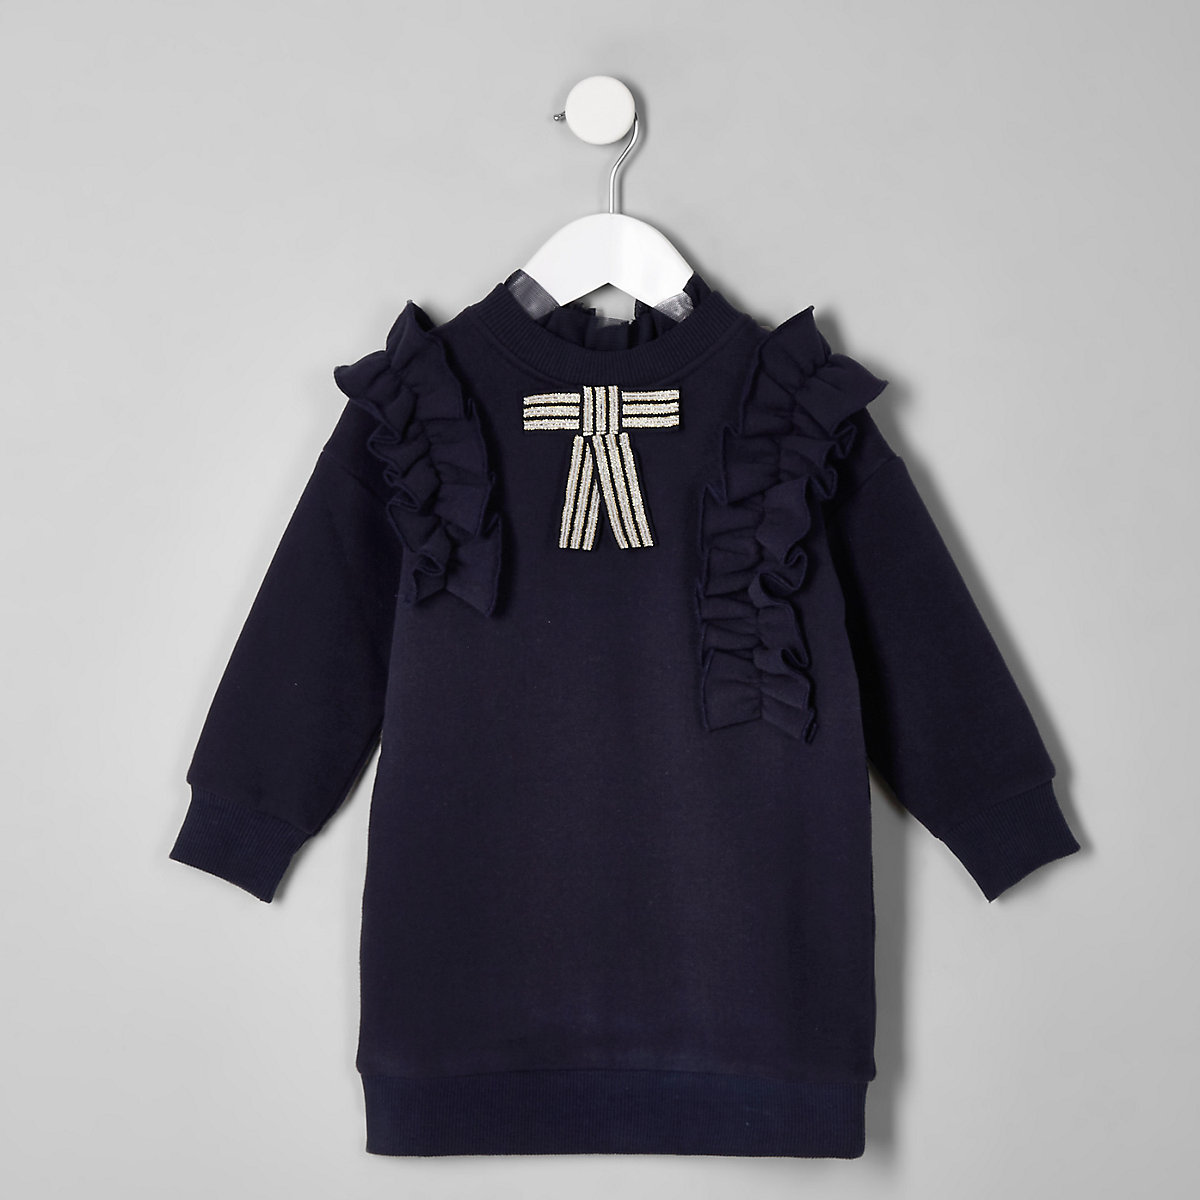 Mini girls navy bow ruffle sweater dress